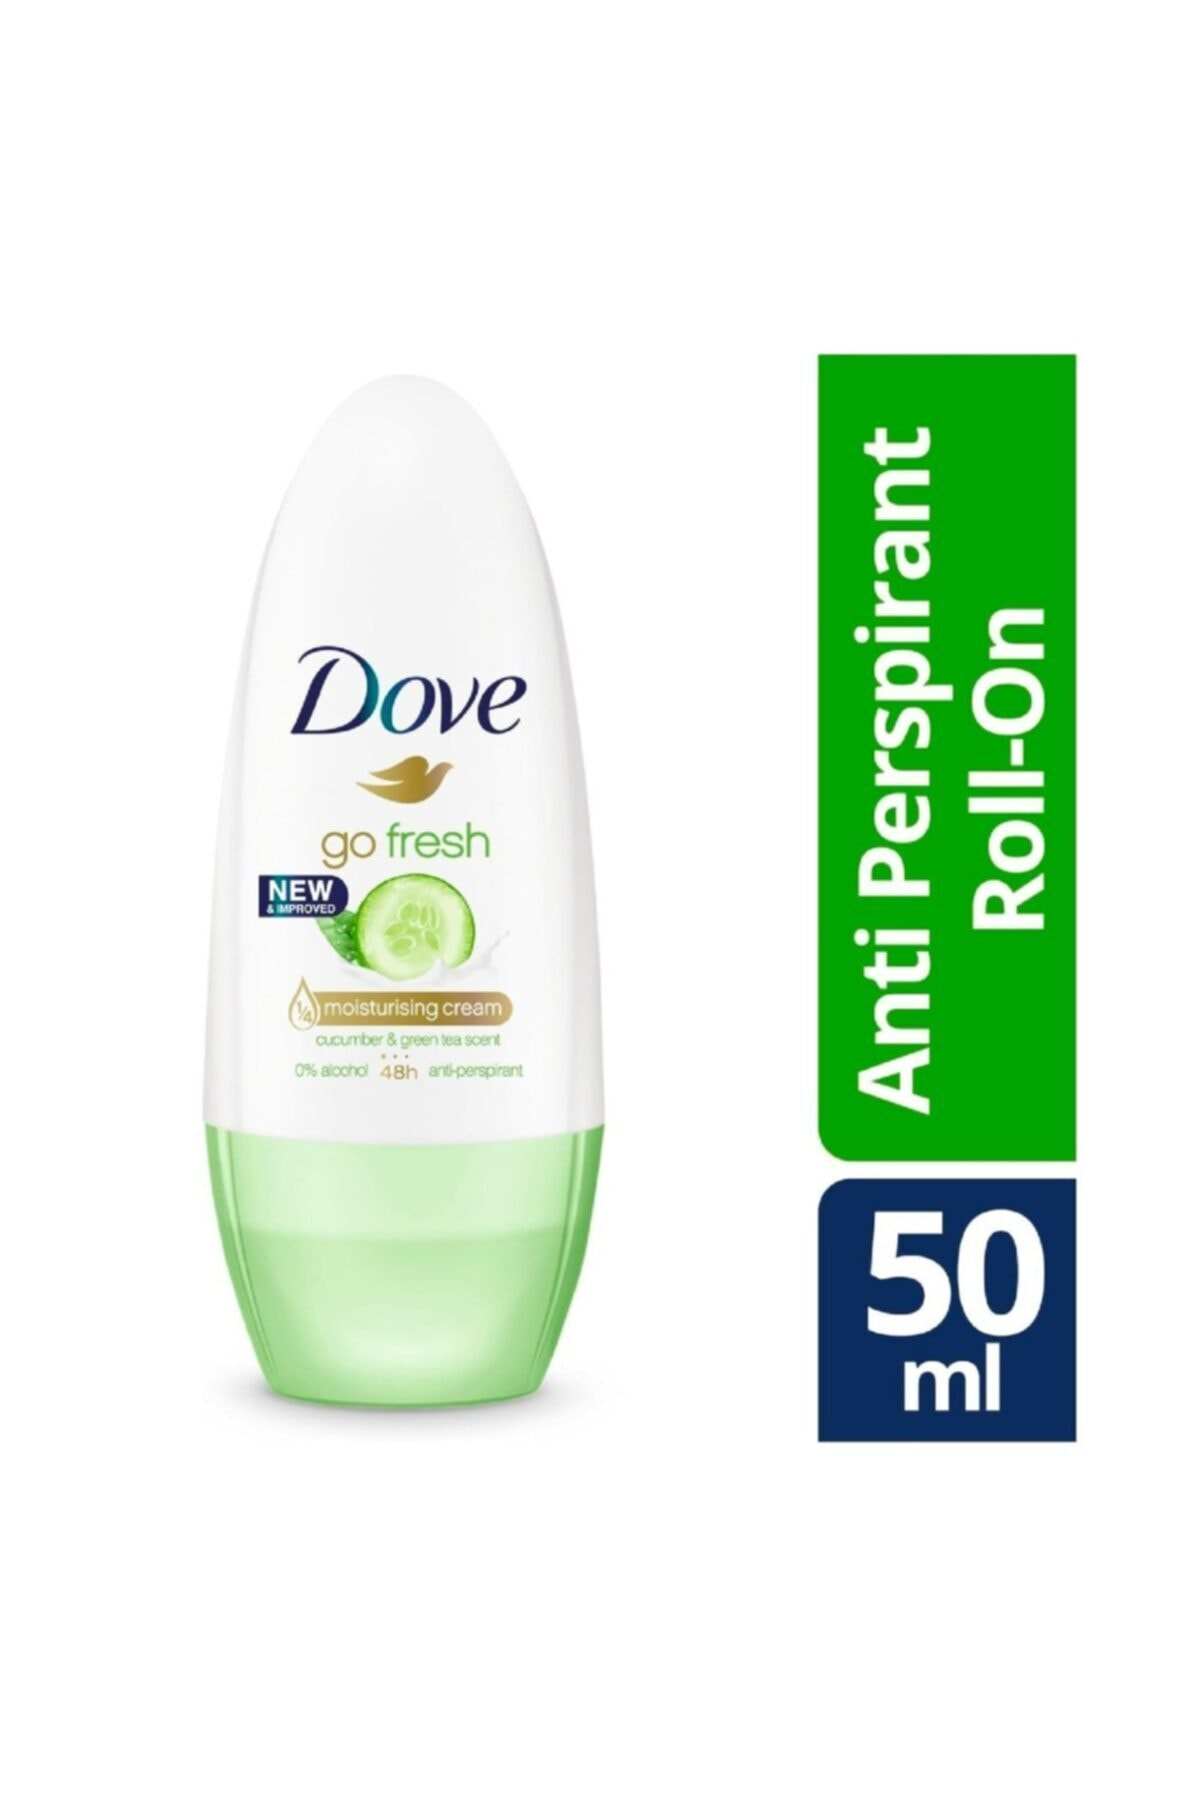 Dove Roll On Bayan Go Fresh Anti-perspirant 48h Deodorant 50ml 1